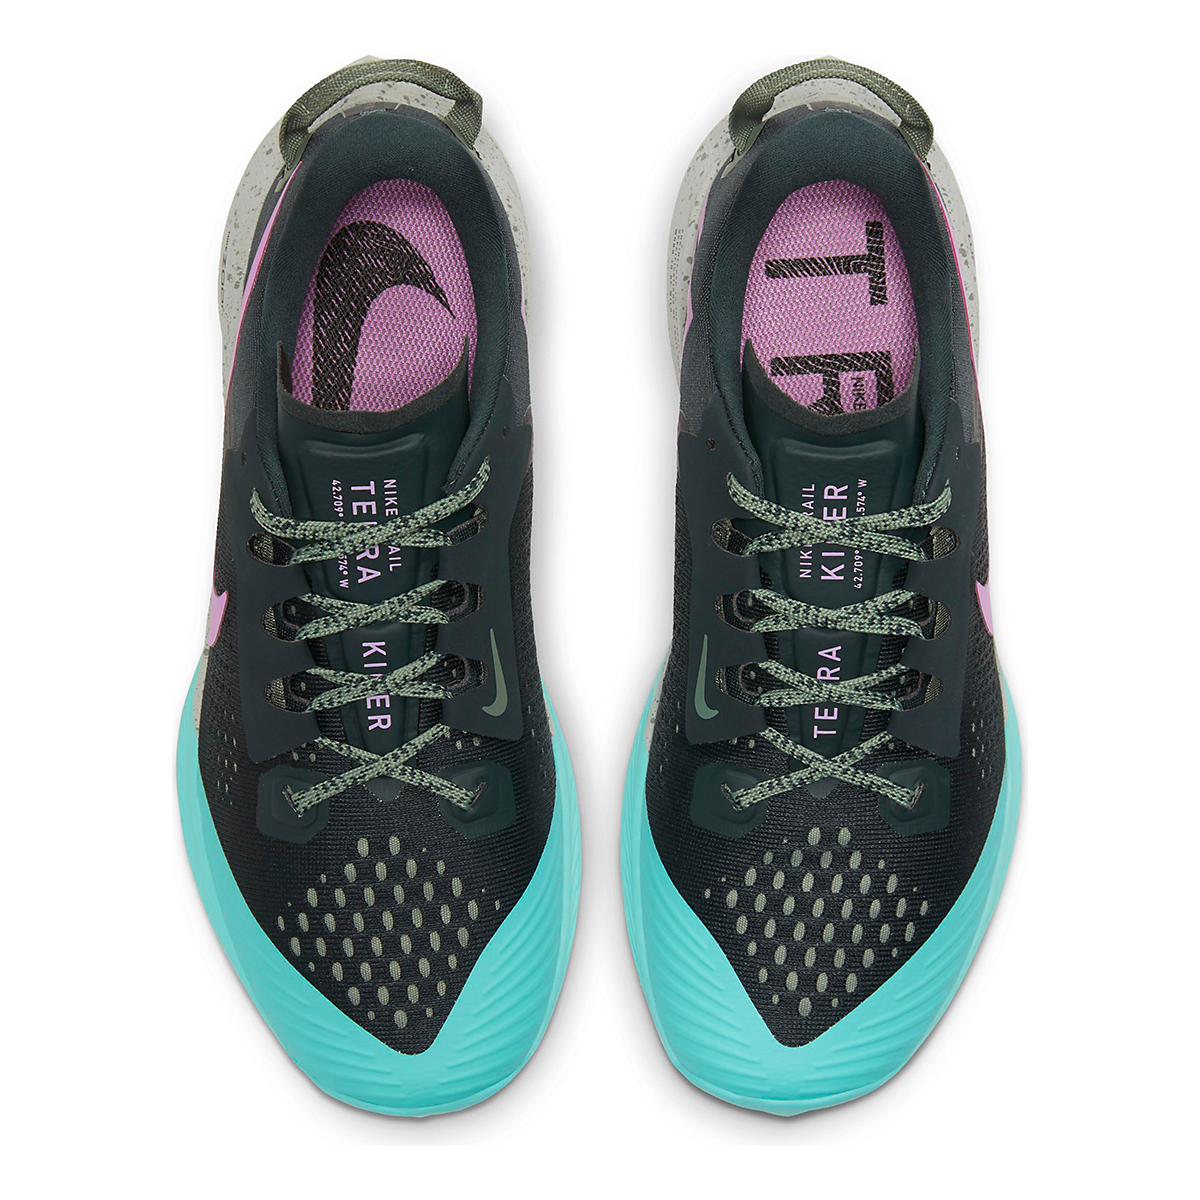 Women's Nike Air Zoom Terra Kiger 6 Trail Running Shoe - Color: Seaweed/Beyond Pink - Size: 5 - Width: Regular, Seaweed/Beyond Pink, large, image 4